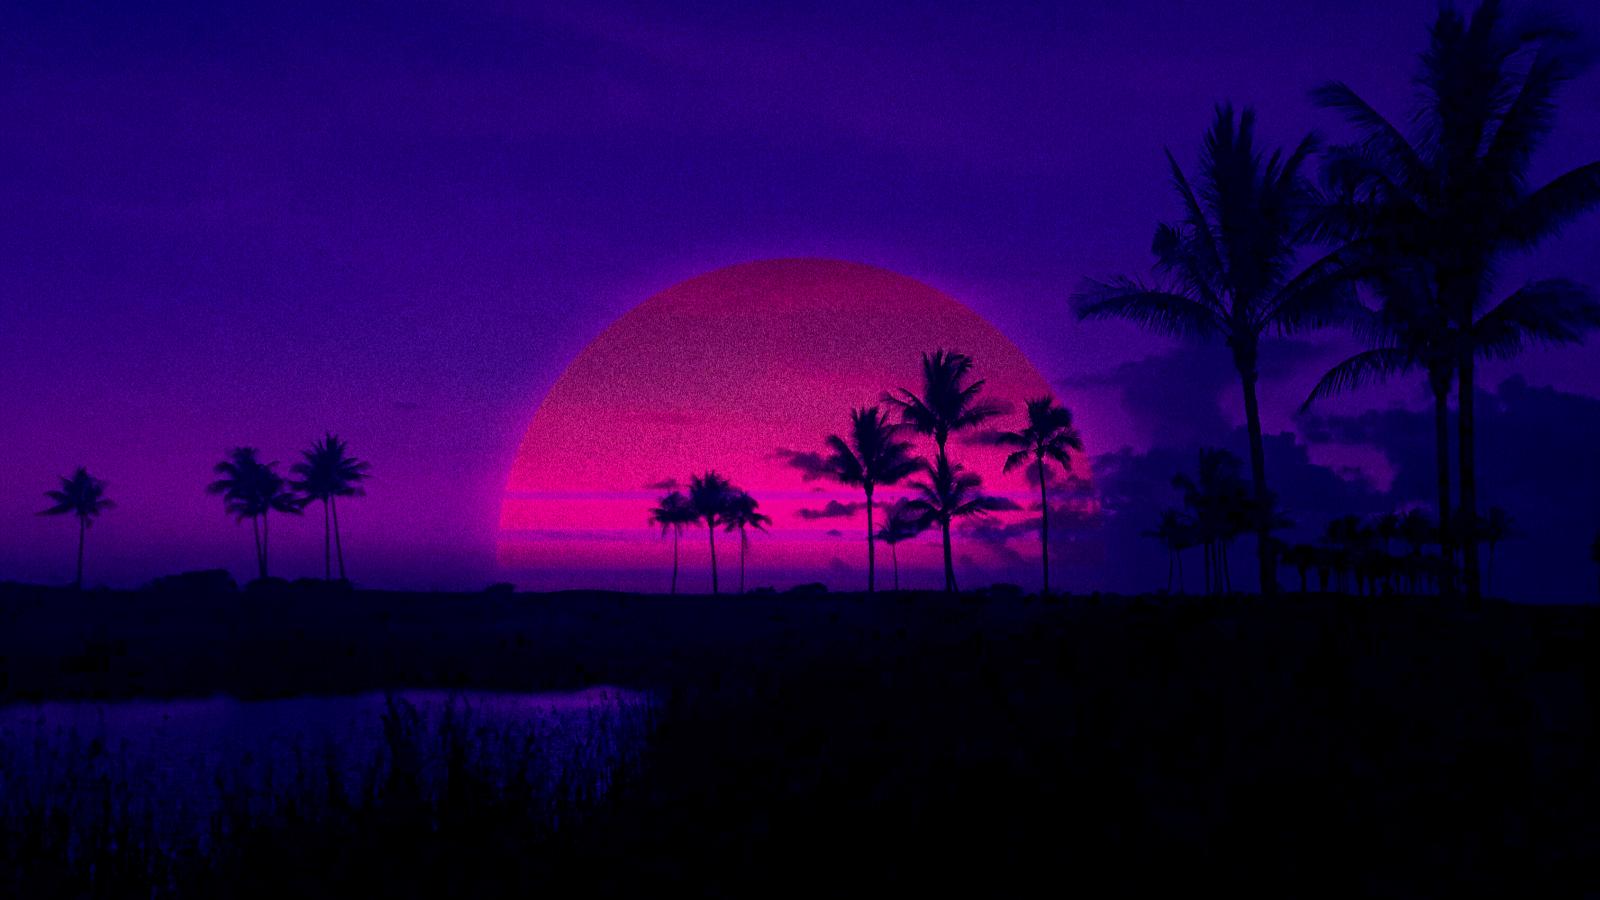 Wallpaper Retrowave Purple Sunset Palm Trees Pink Shadow Dark Background 3024x1701 Celgarta 1422765 Hd Wallpapers Wallhere